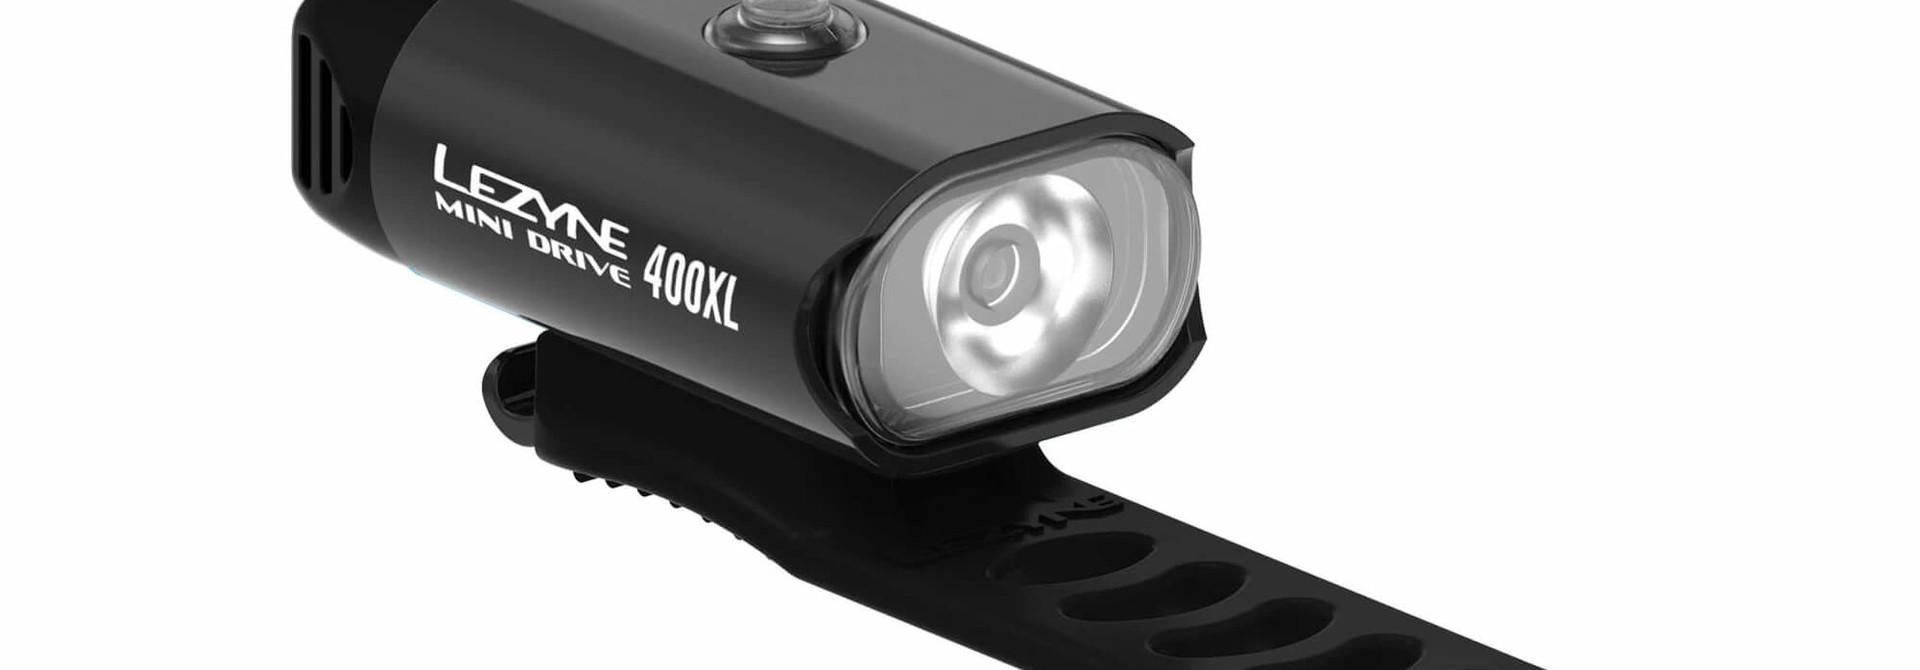 LED Mini Drive 400XL Black Y13